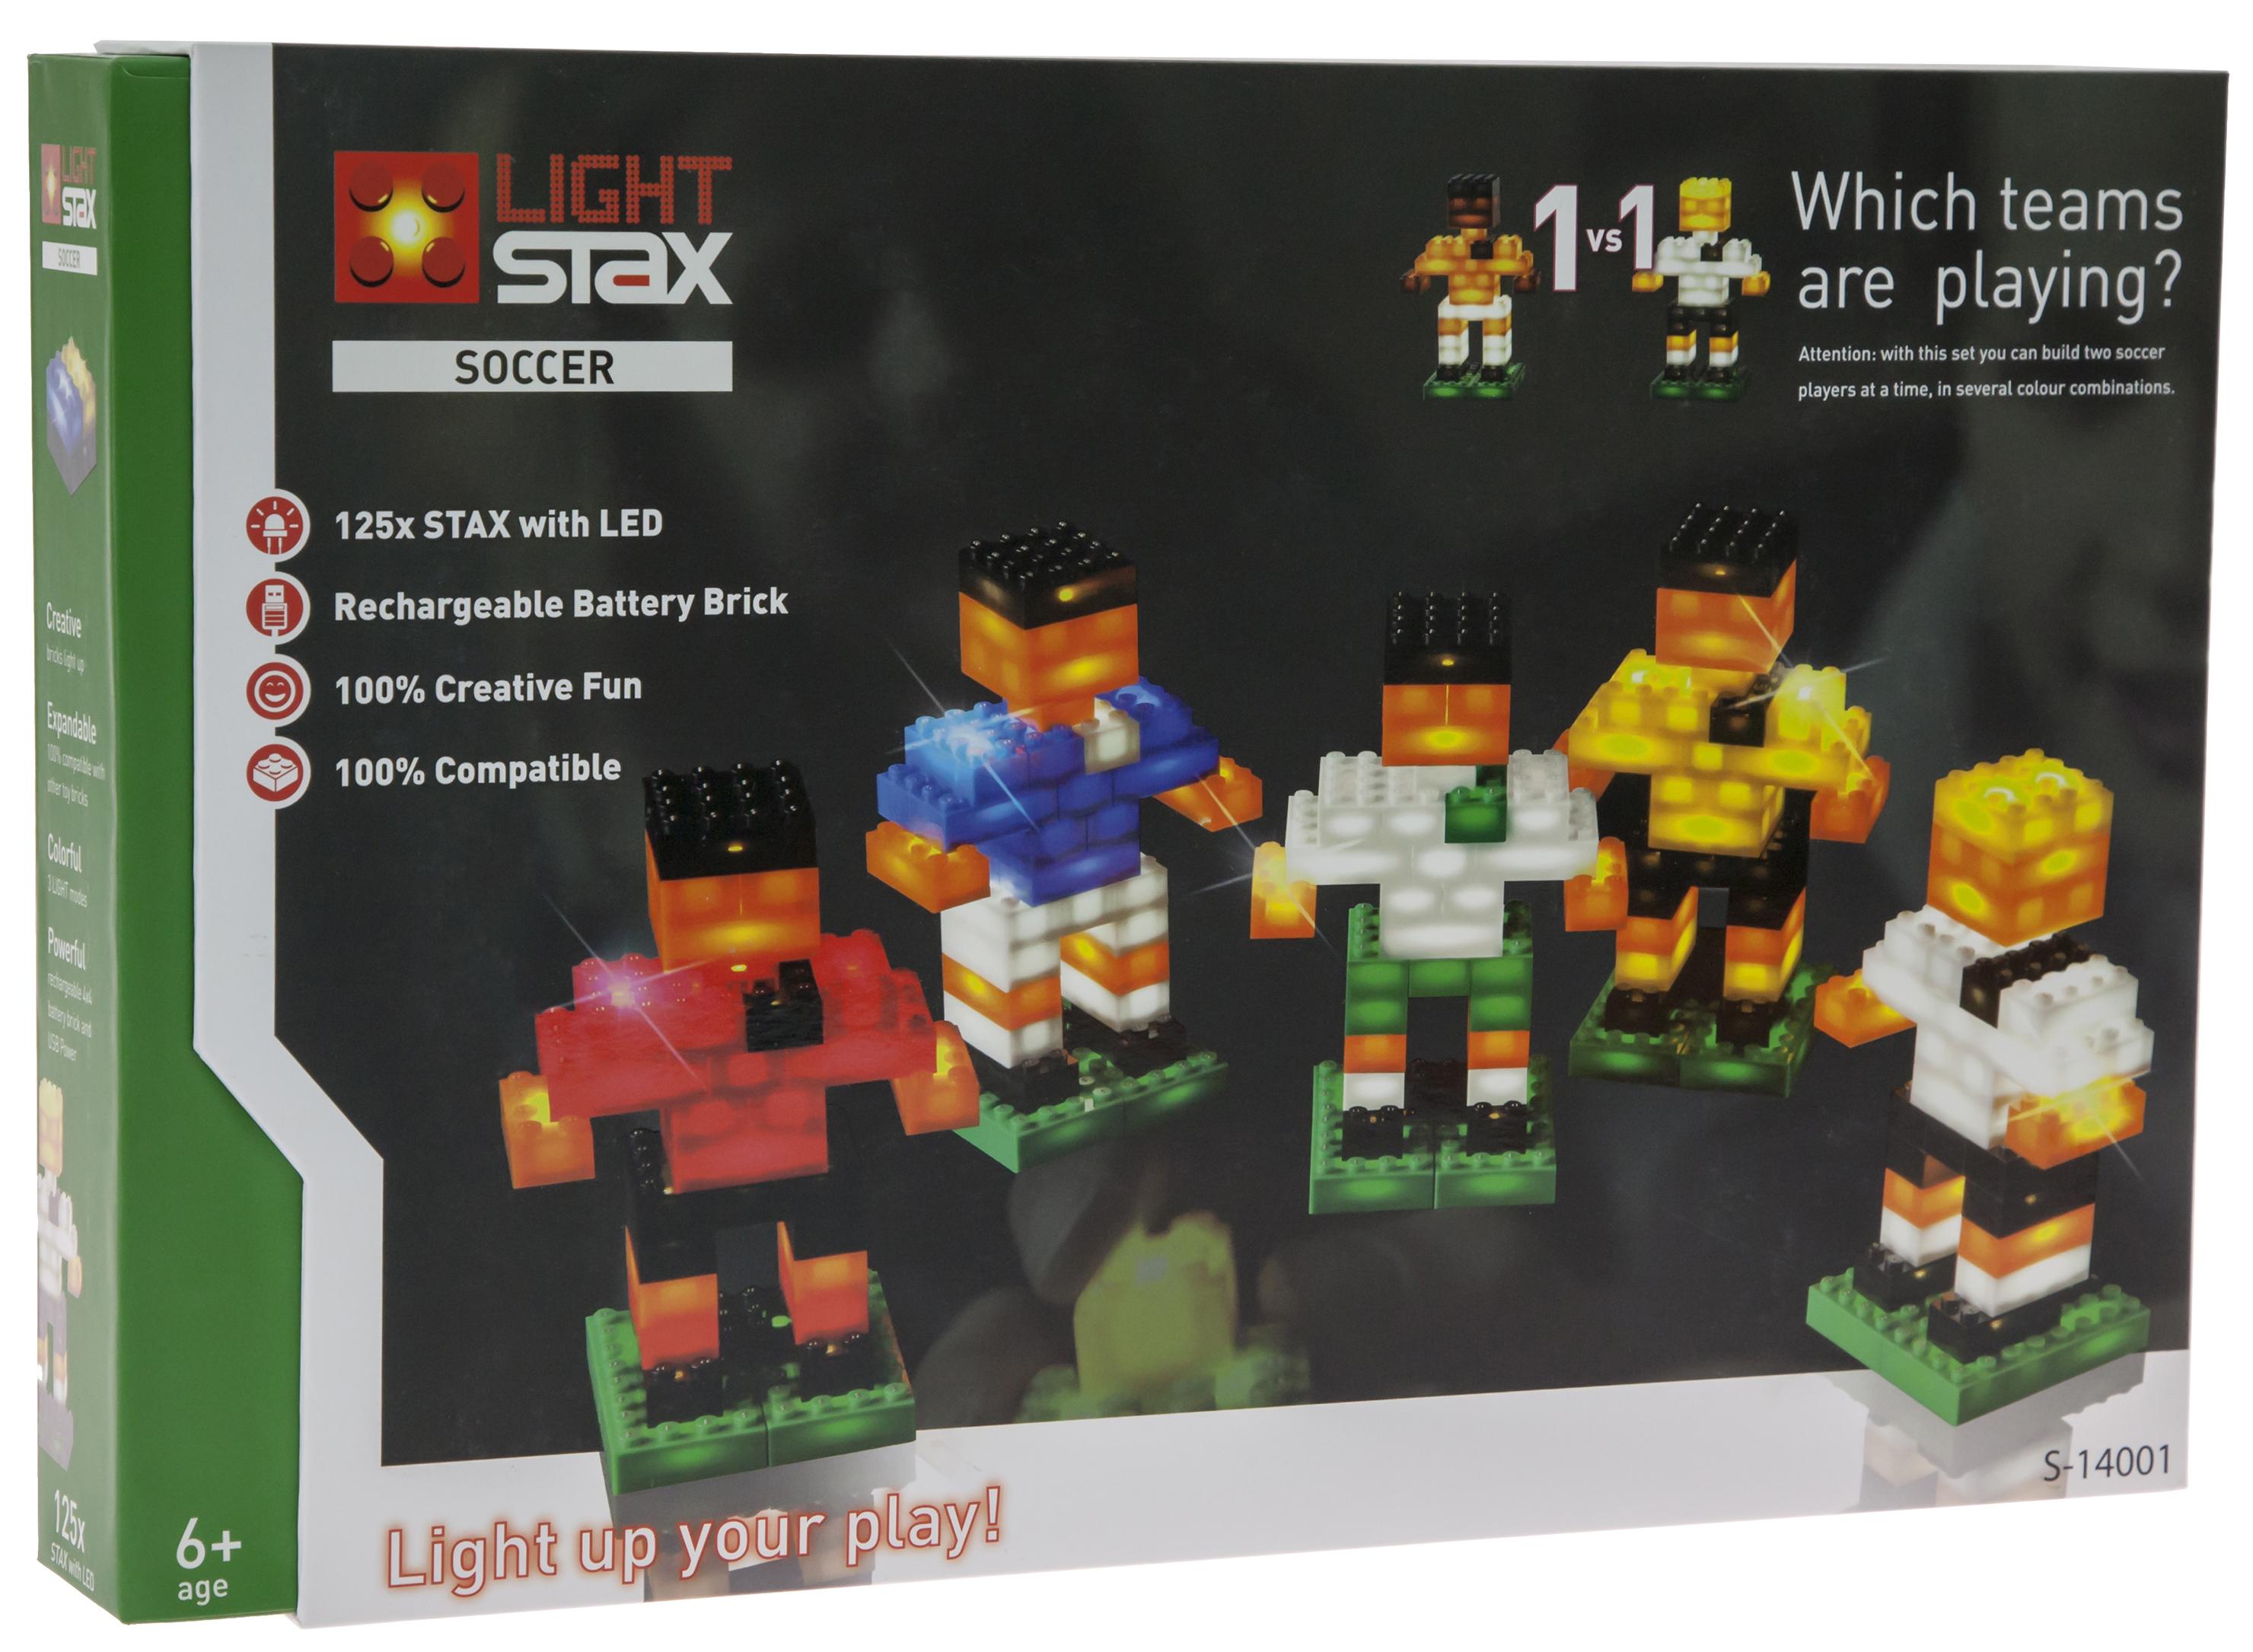 LIGHT STAX Конструктор с LED подсветкой Soccer LS-S14001